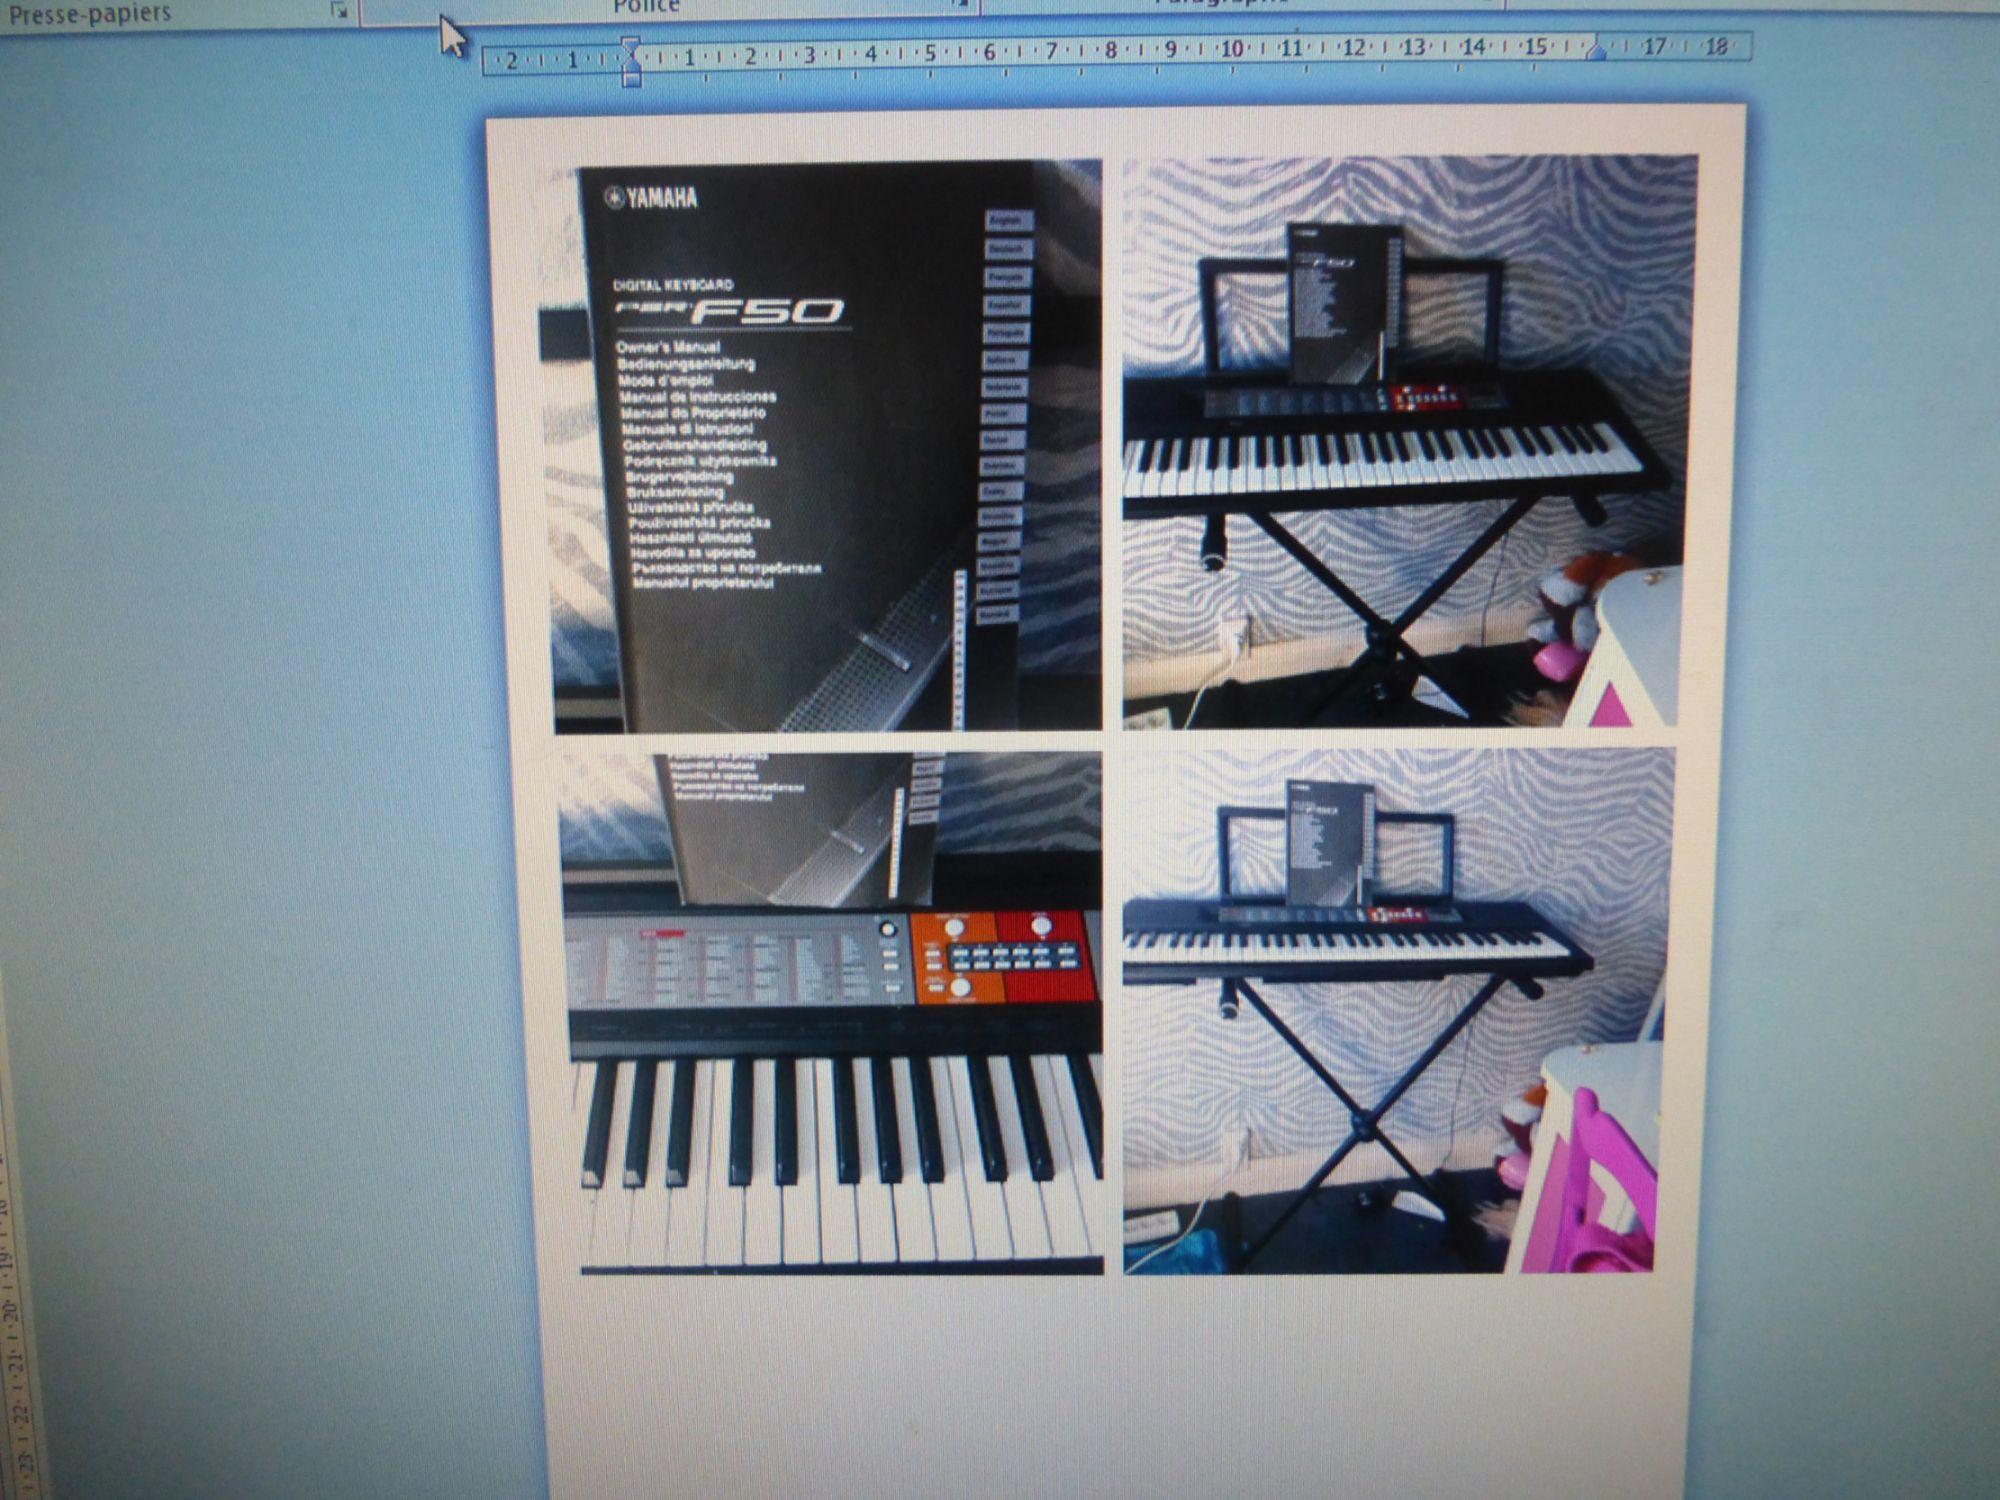 Vente Yamaha Piano Yamaha